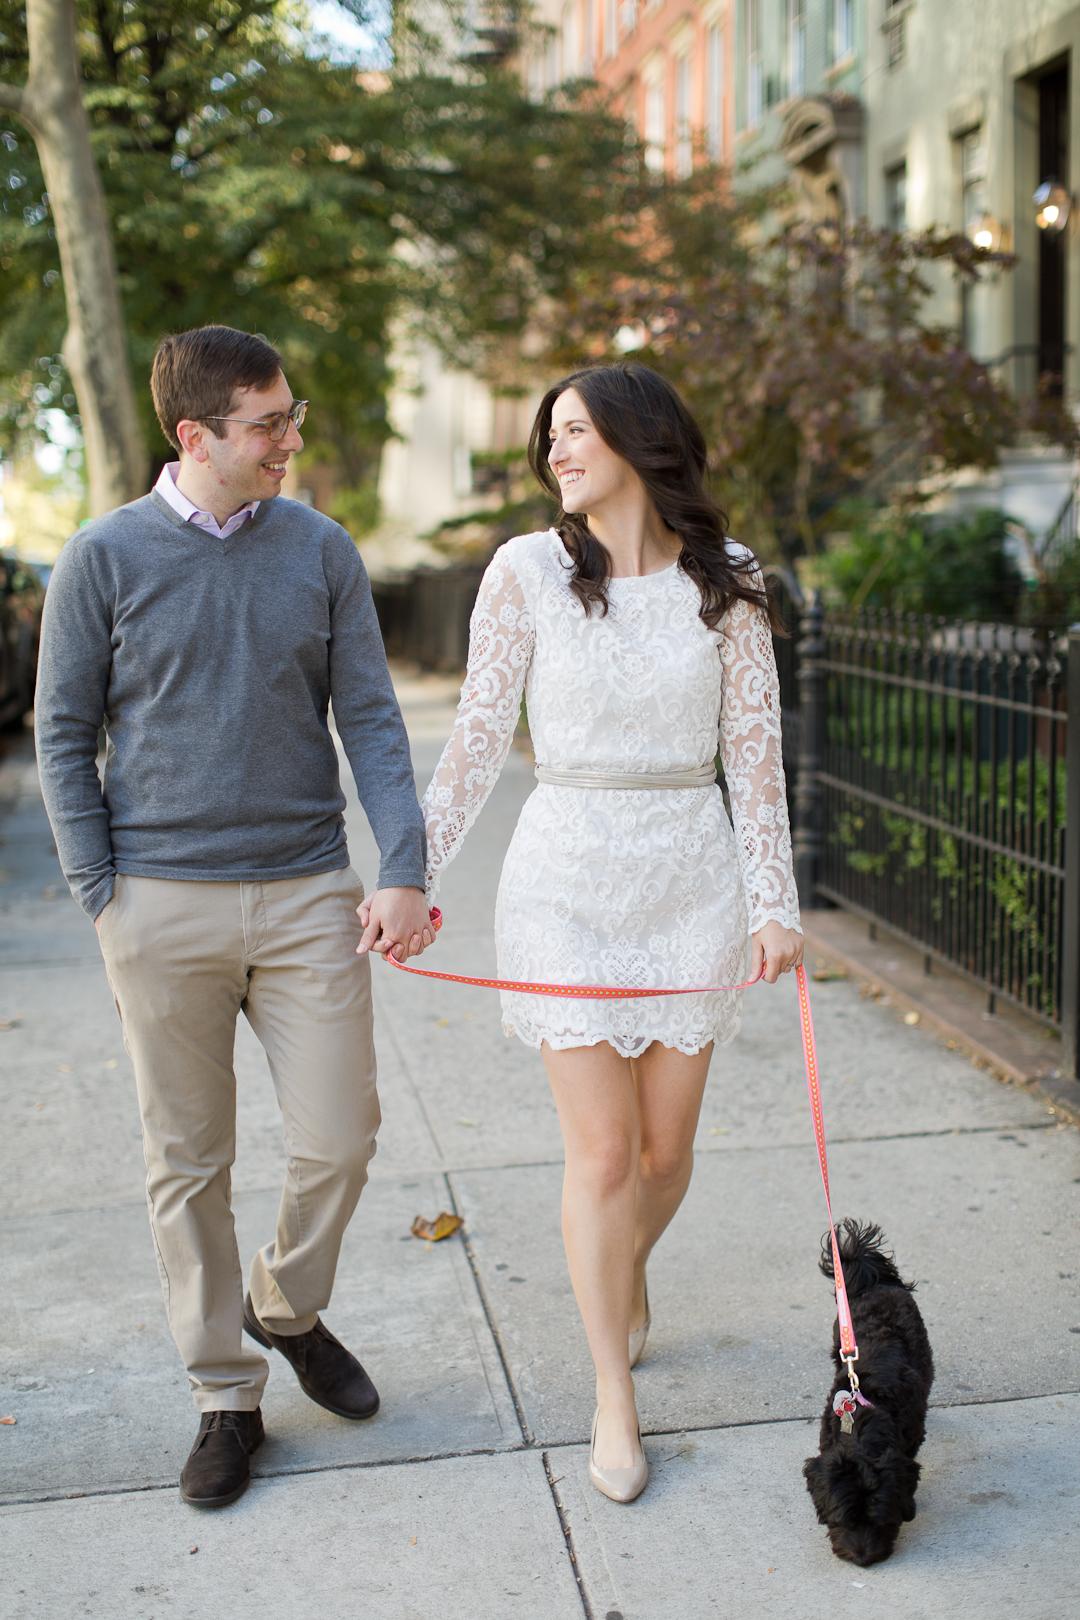 Melissa Kruse Photography - Christina & Alex Kips Bay Engagement Photos-20.jpg